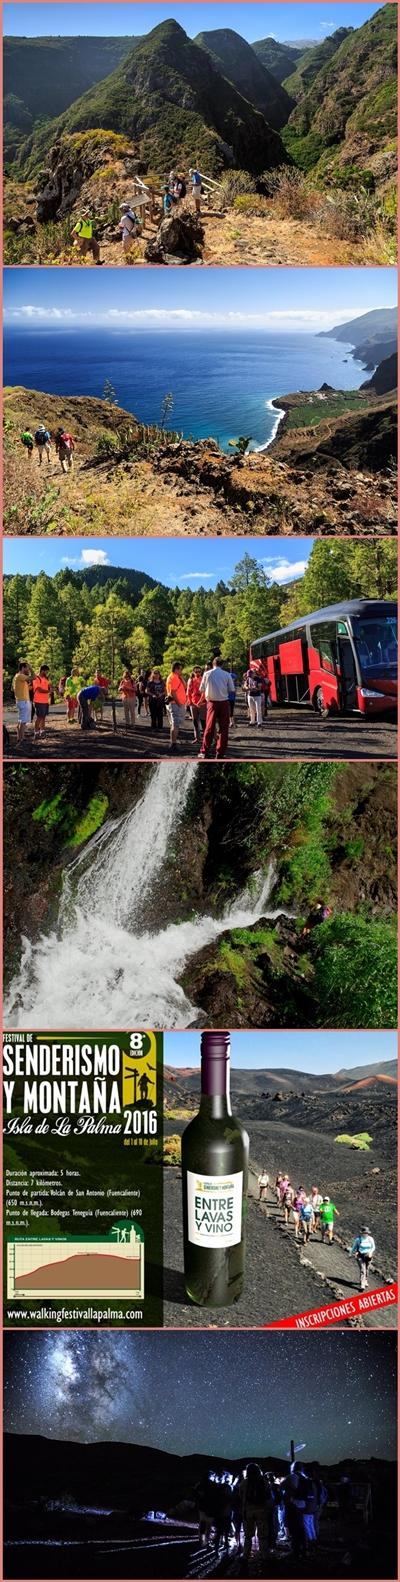 Wanderfestival La Palma: Bei geführten Touren die Isla Bonita entdecken. Fotos: Festival de Senderismo La Palma